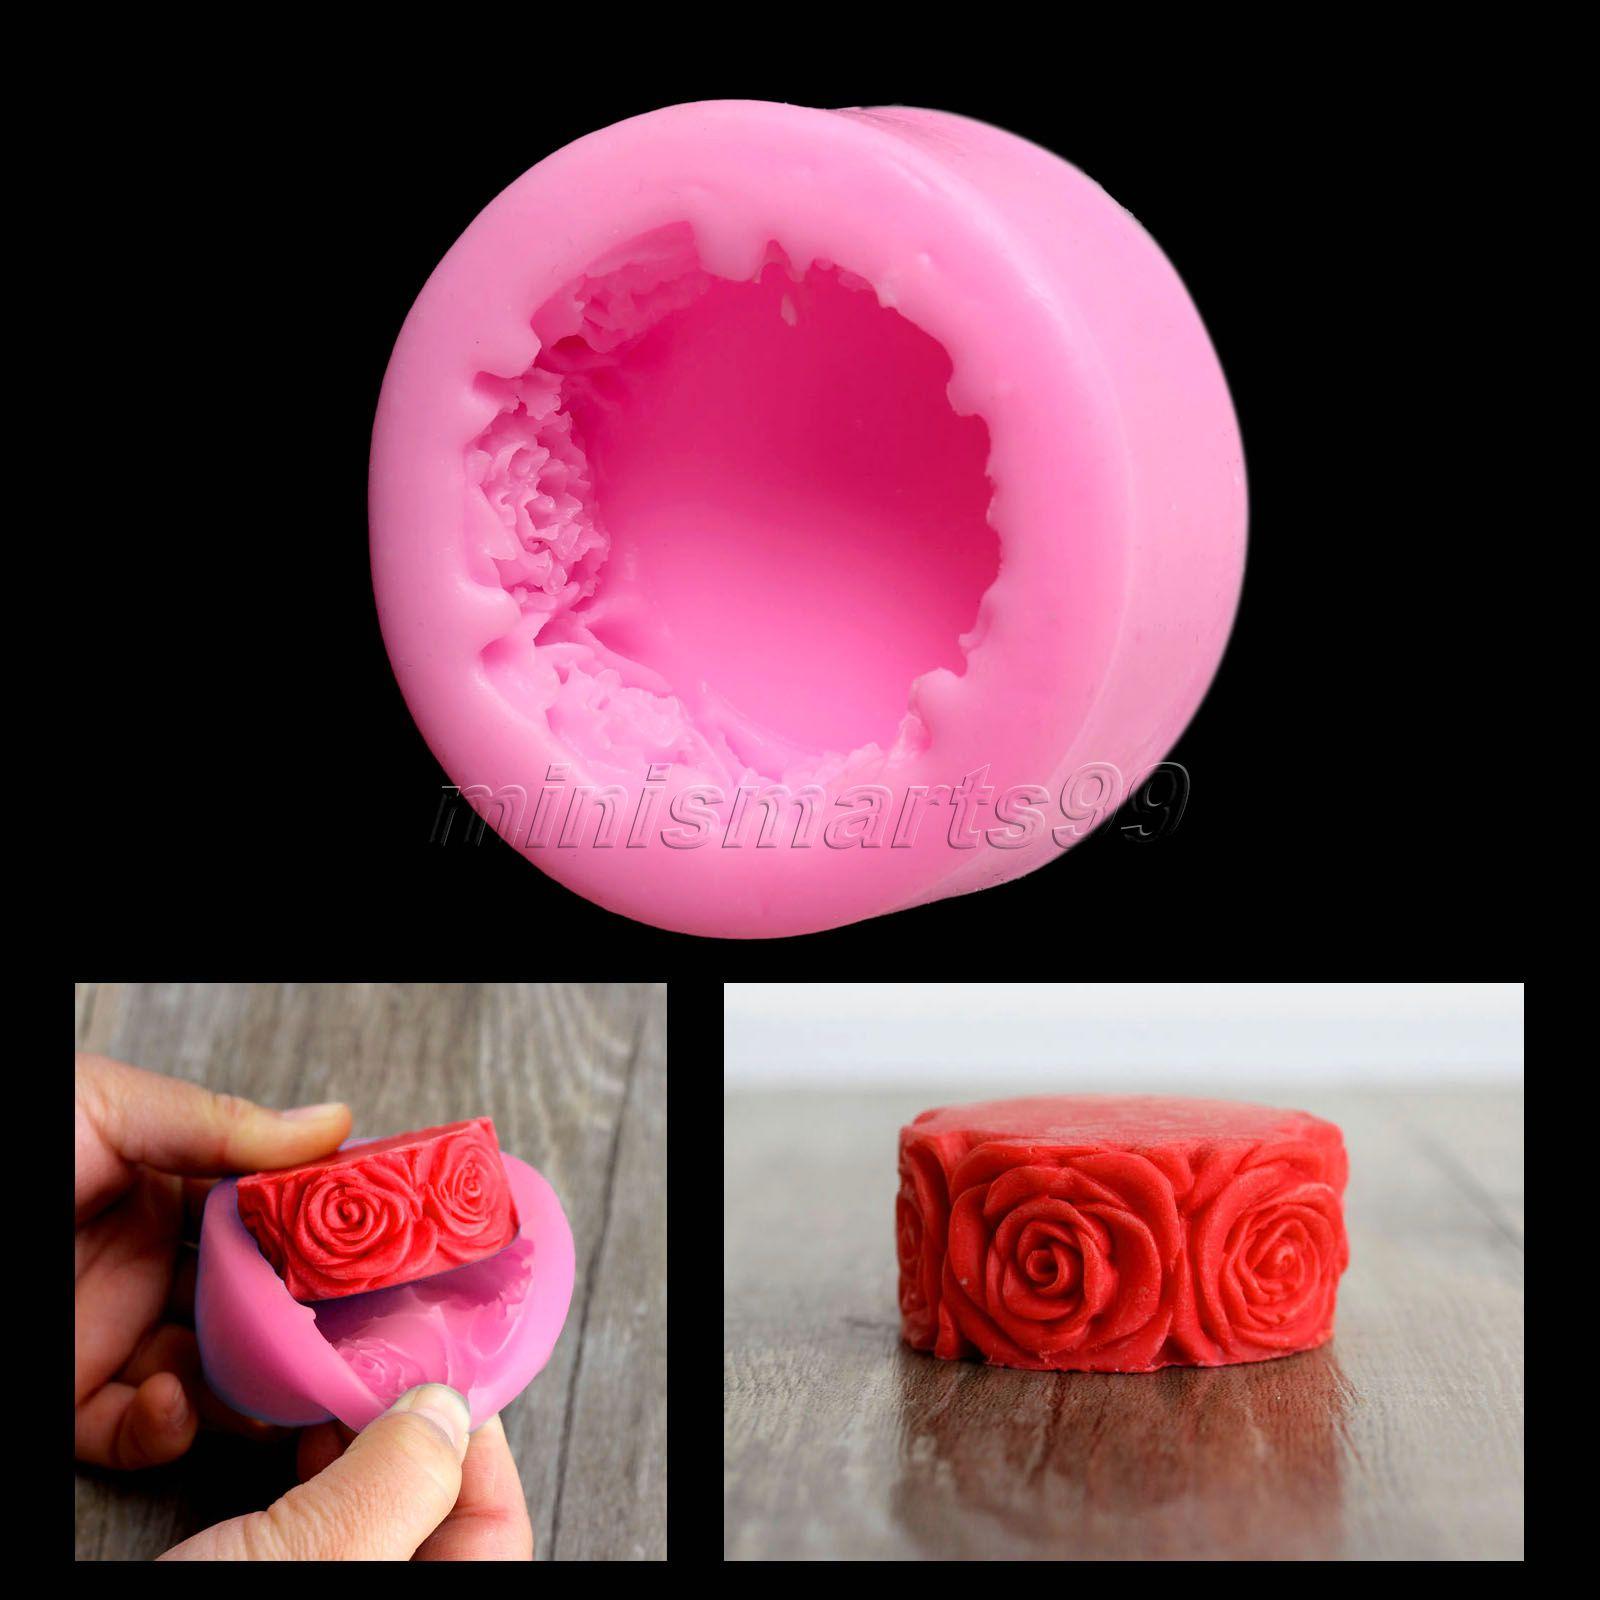 Nicole Rose Flowers Round Silicone Mögelformar för tvål DIY Hantverk Mögelstearin Stampi In Silicone Cake Tools